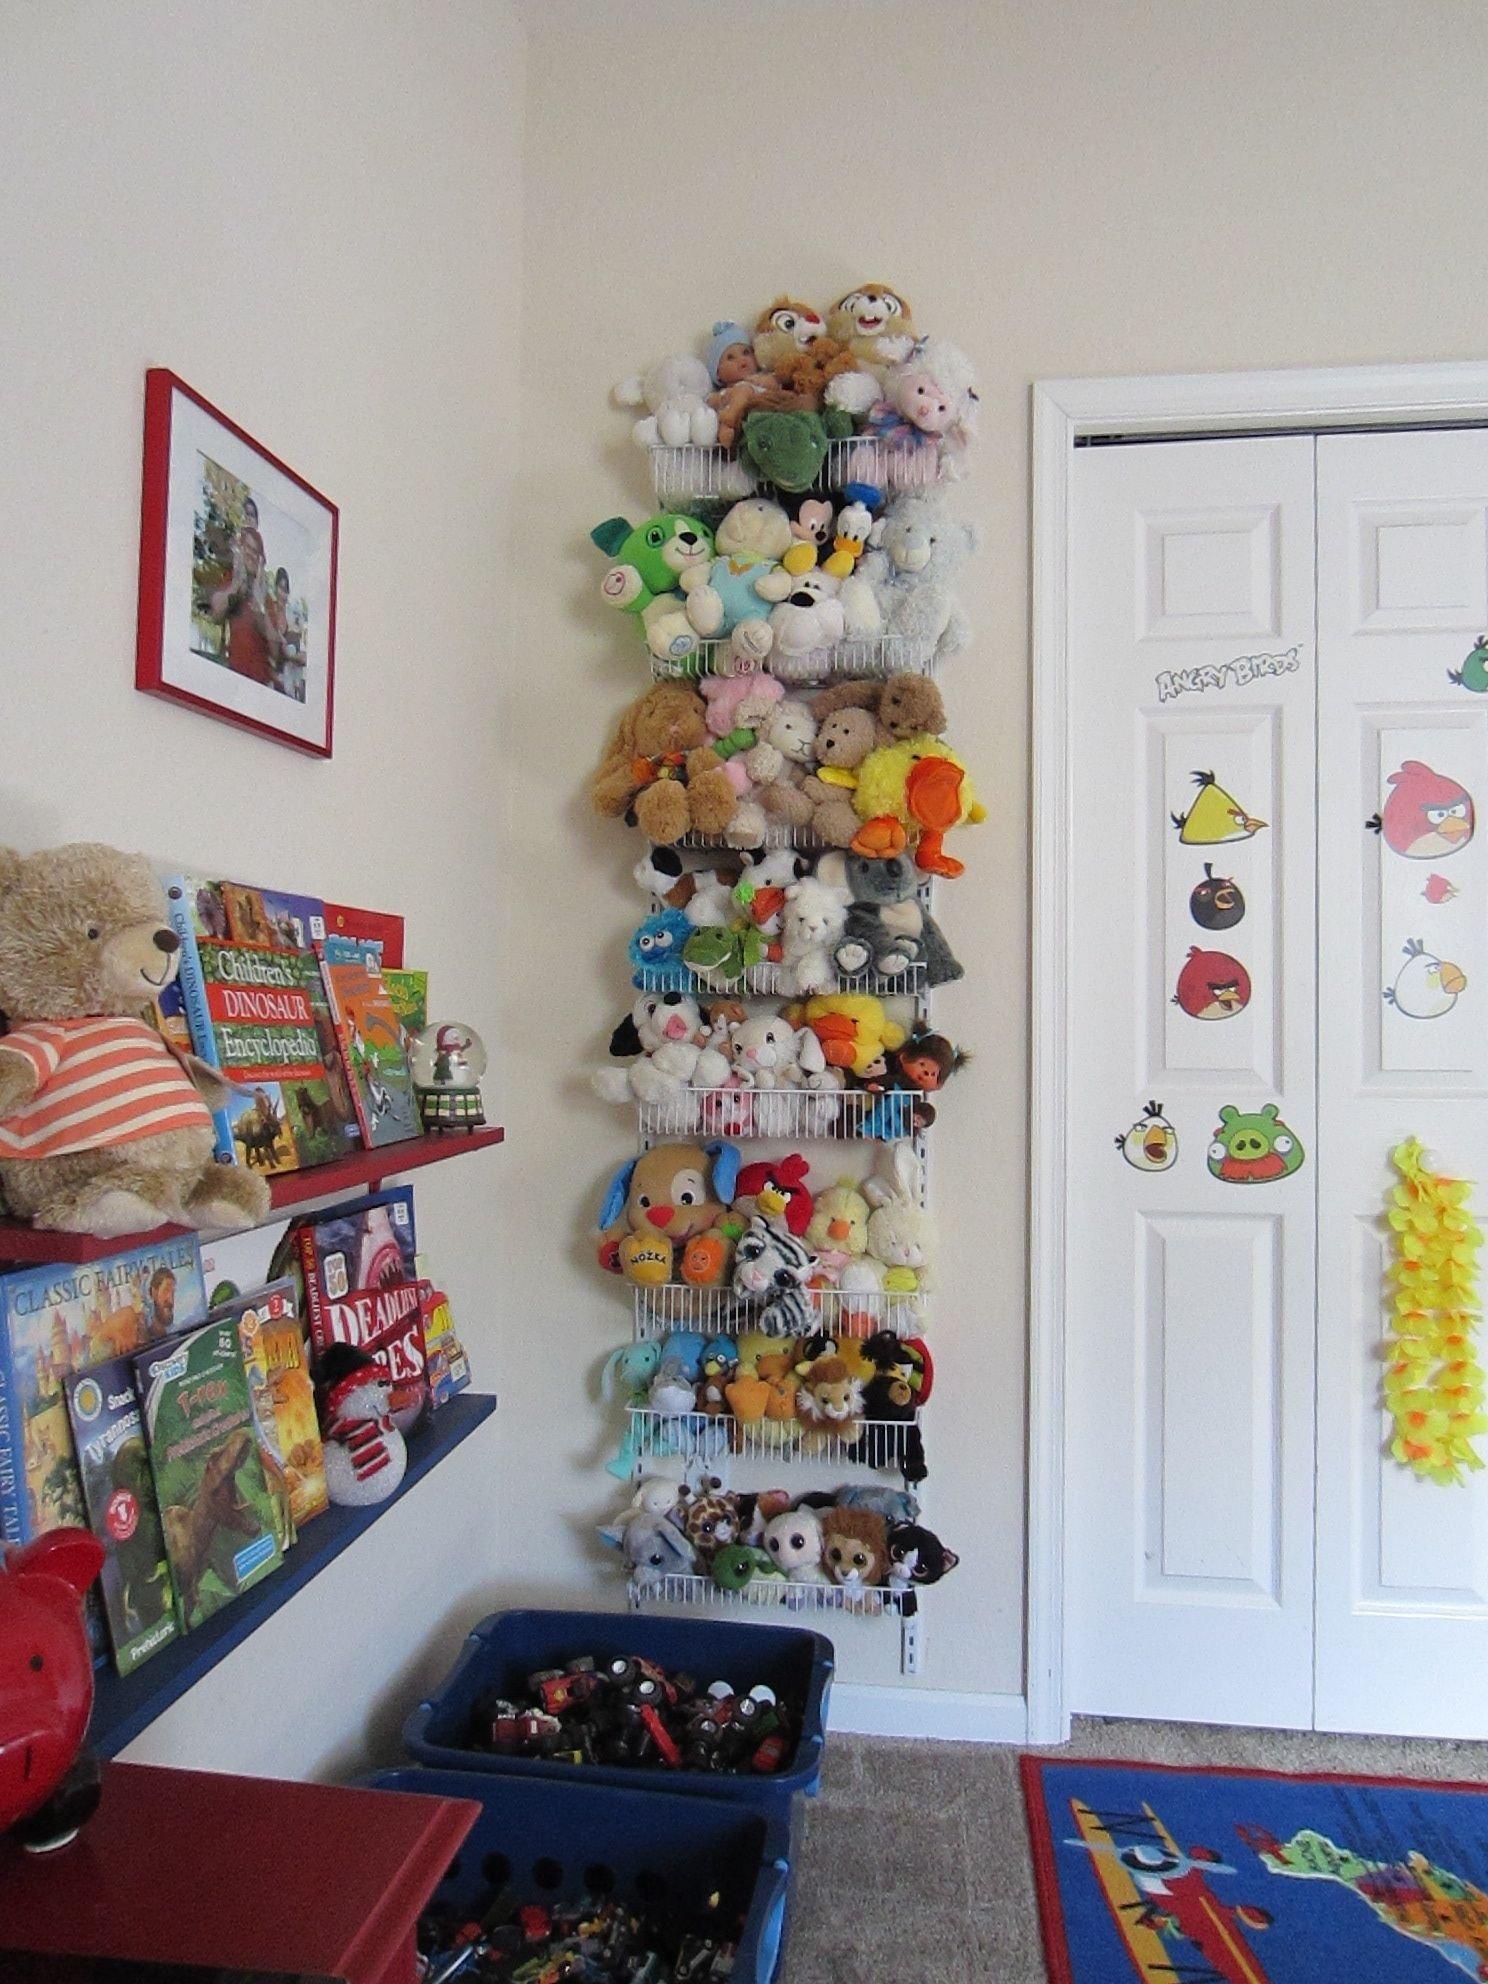 10 Spectacular Ideas For Stuffed Animal Storage stuffed animals storage closet maid 8 tier adjustable door rack 1 2021